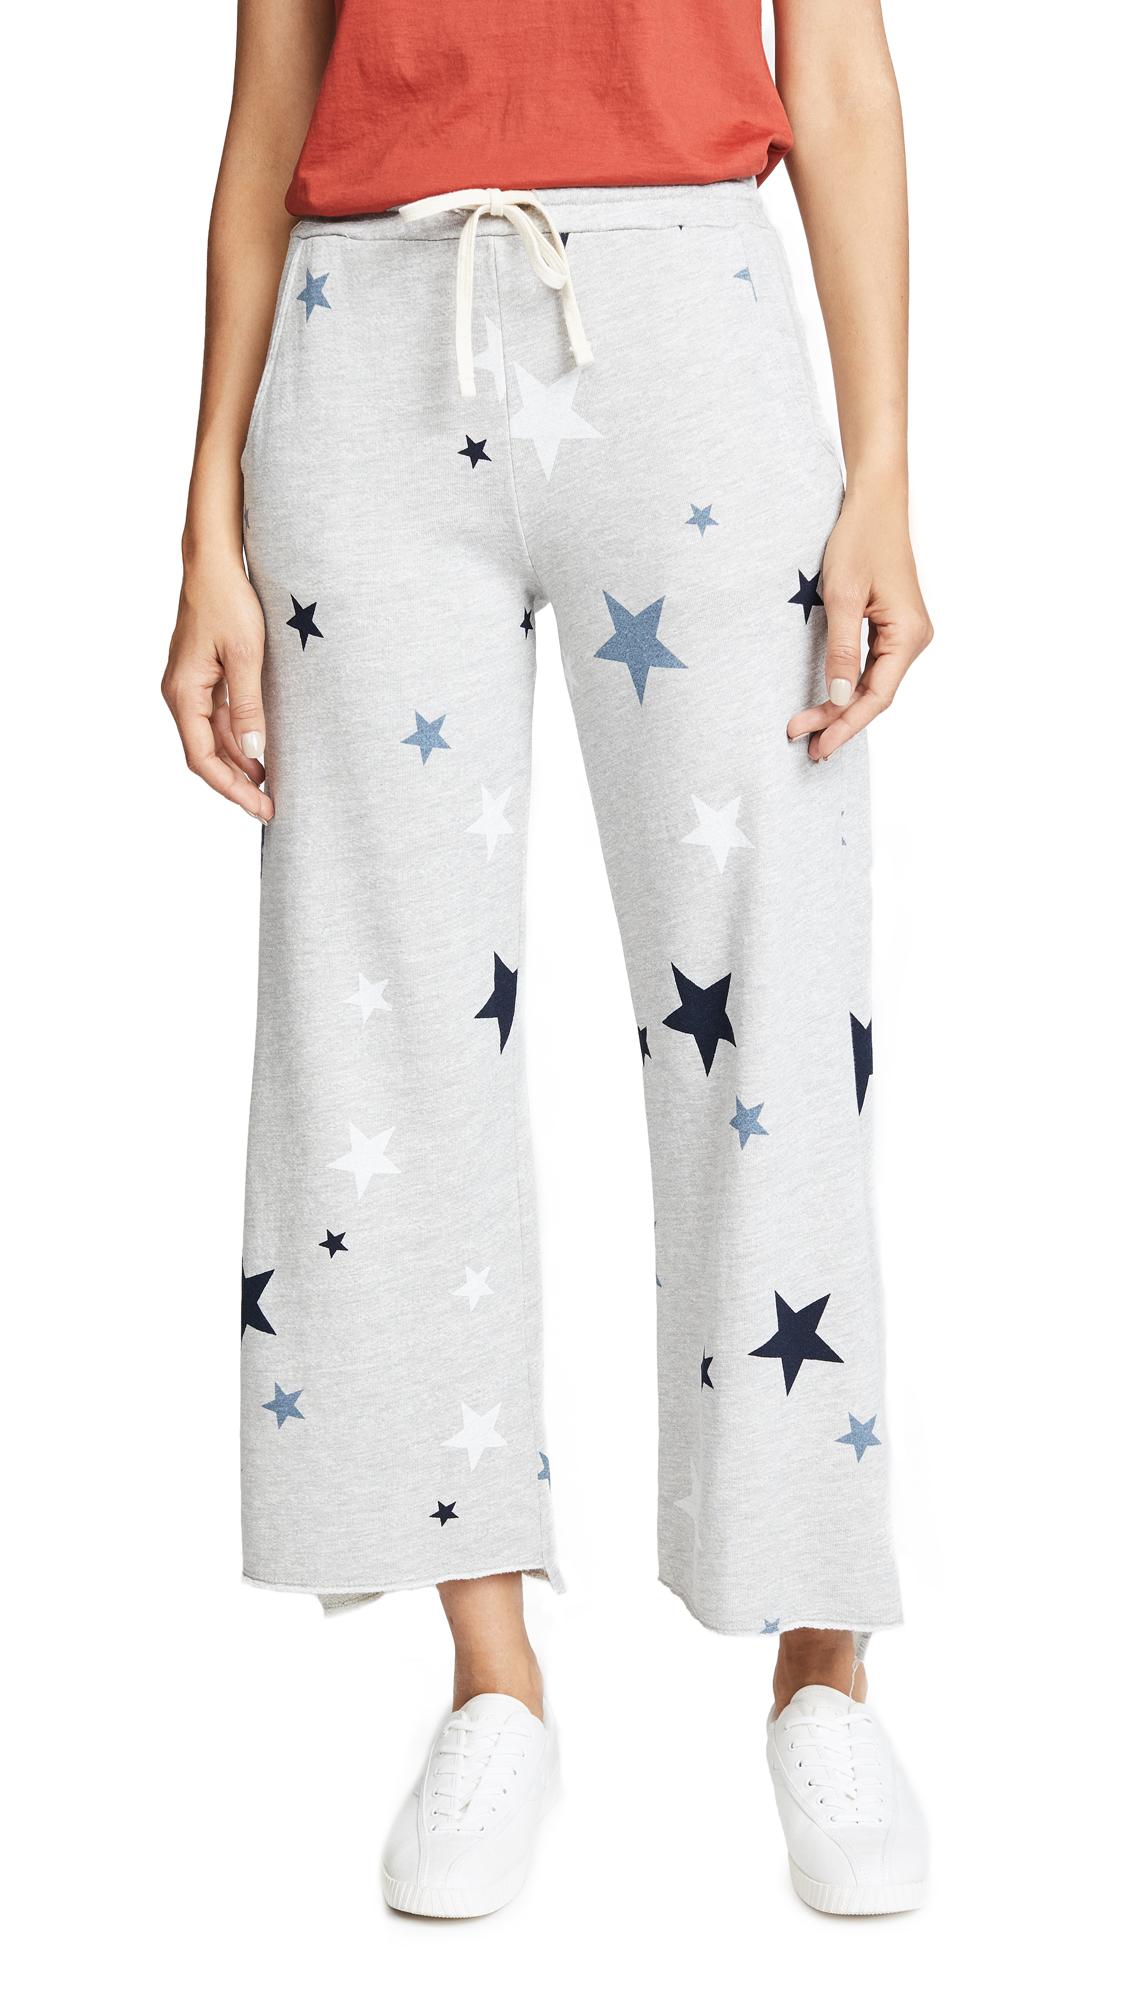 SUNDRY Stars Flare Sweatpants